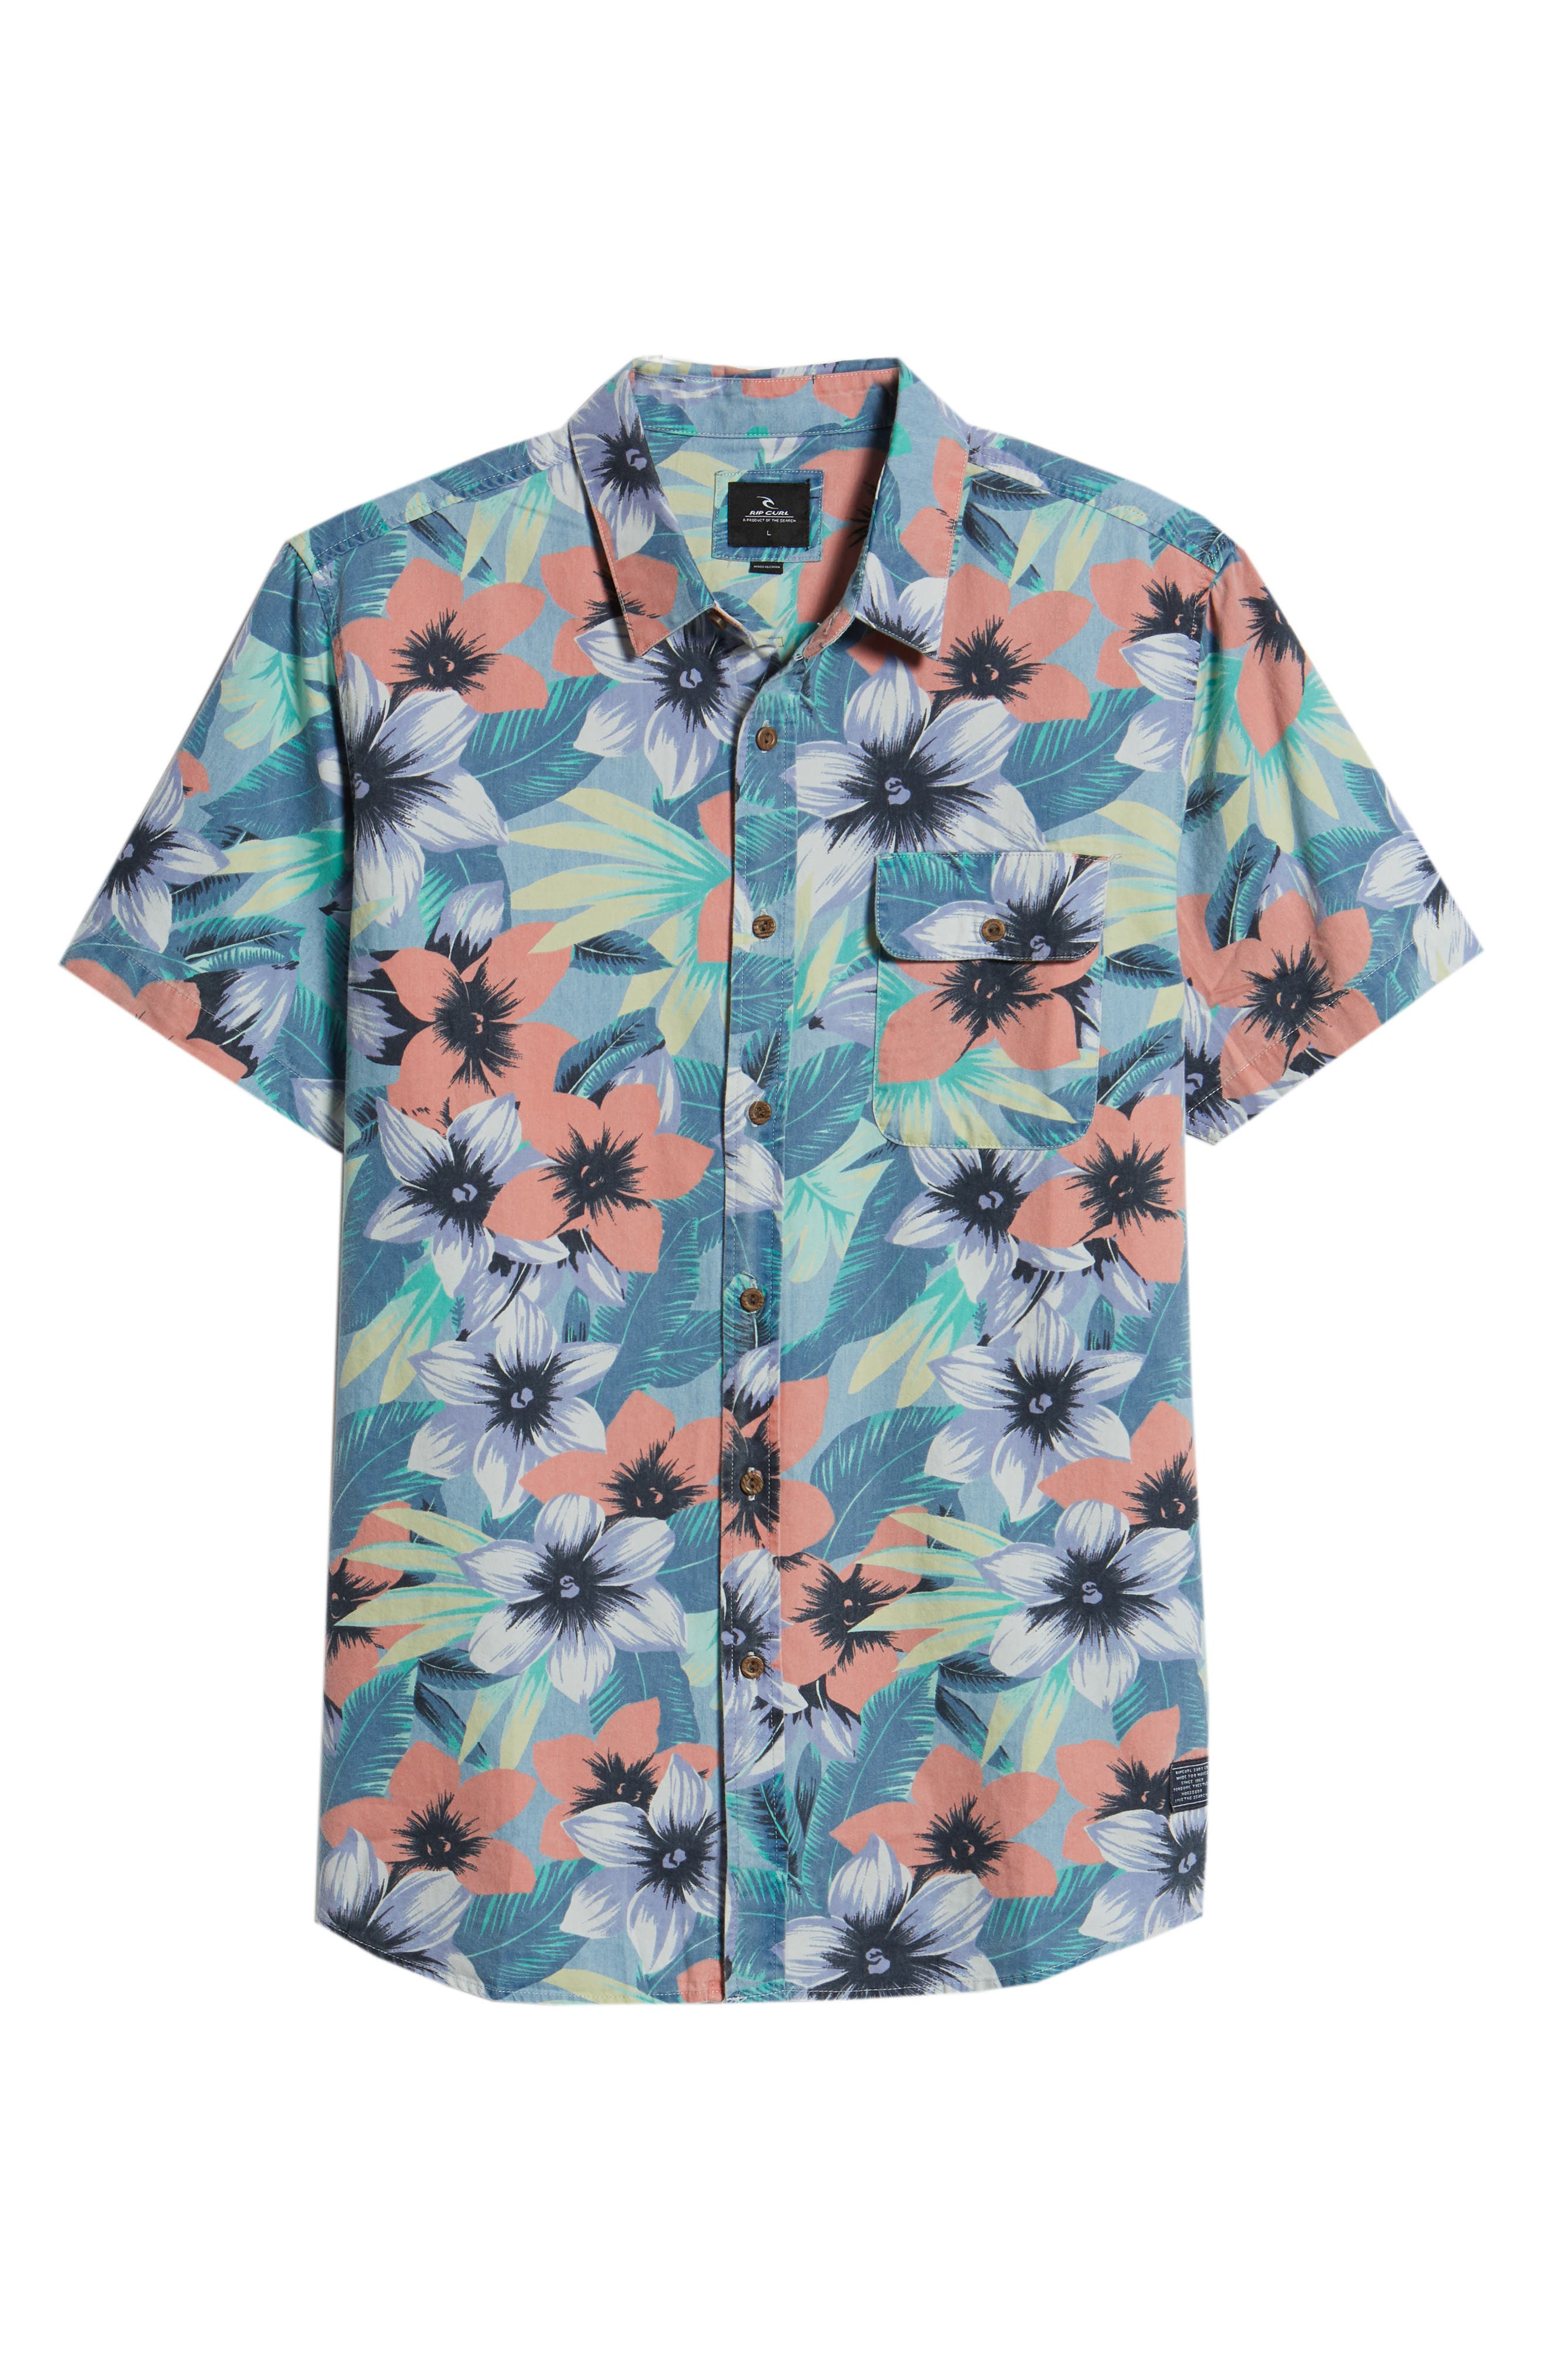 Meledrone Woven Shirt,                             Alternate thumbnail 12, color,